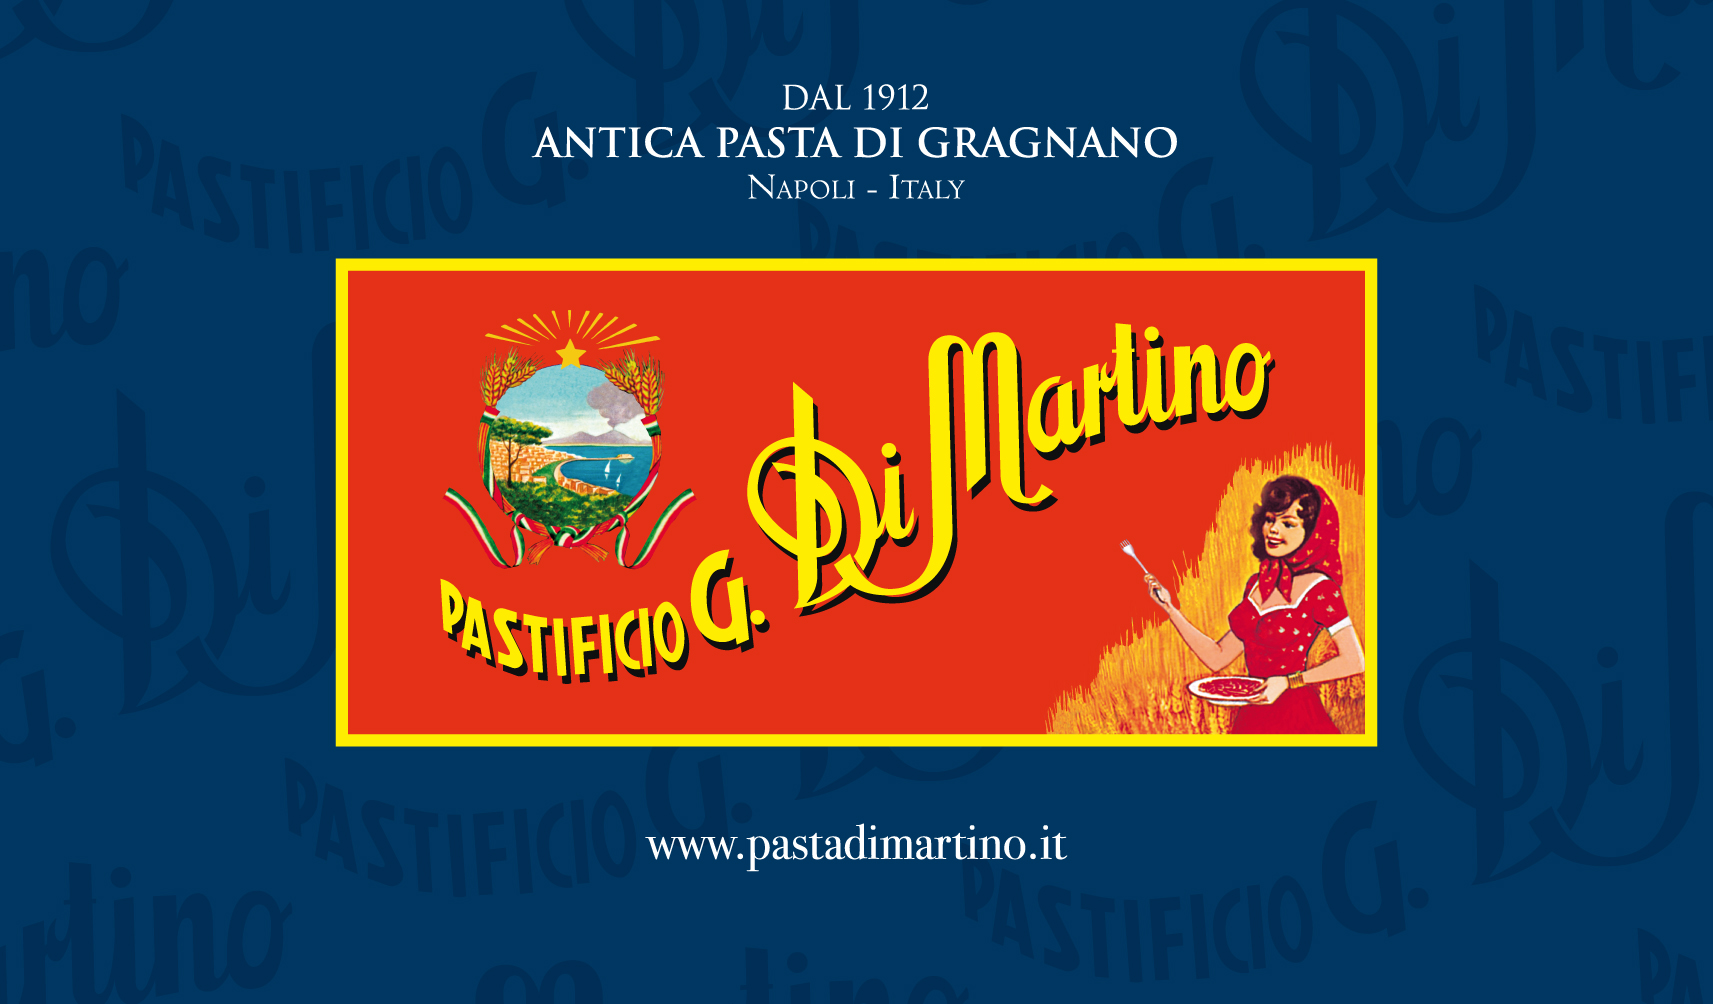 DiMartino logo